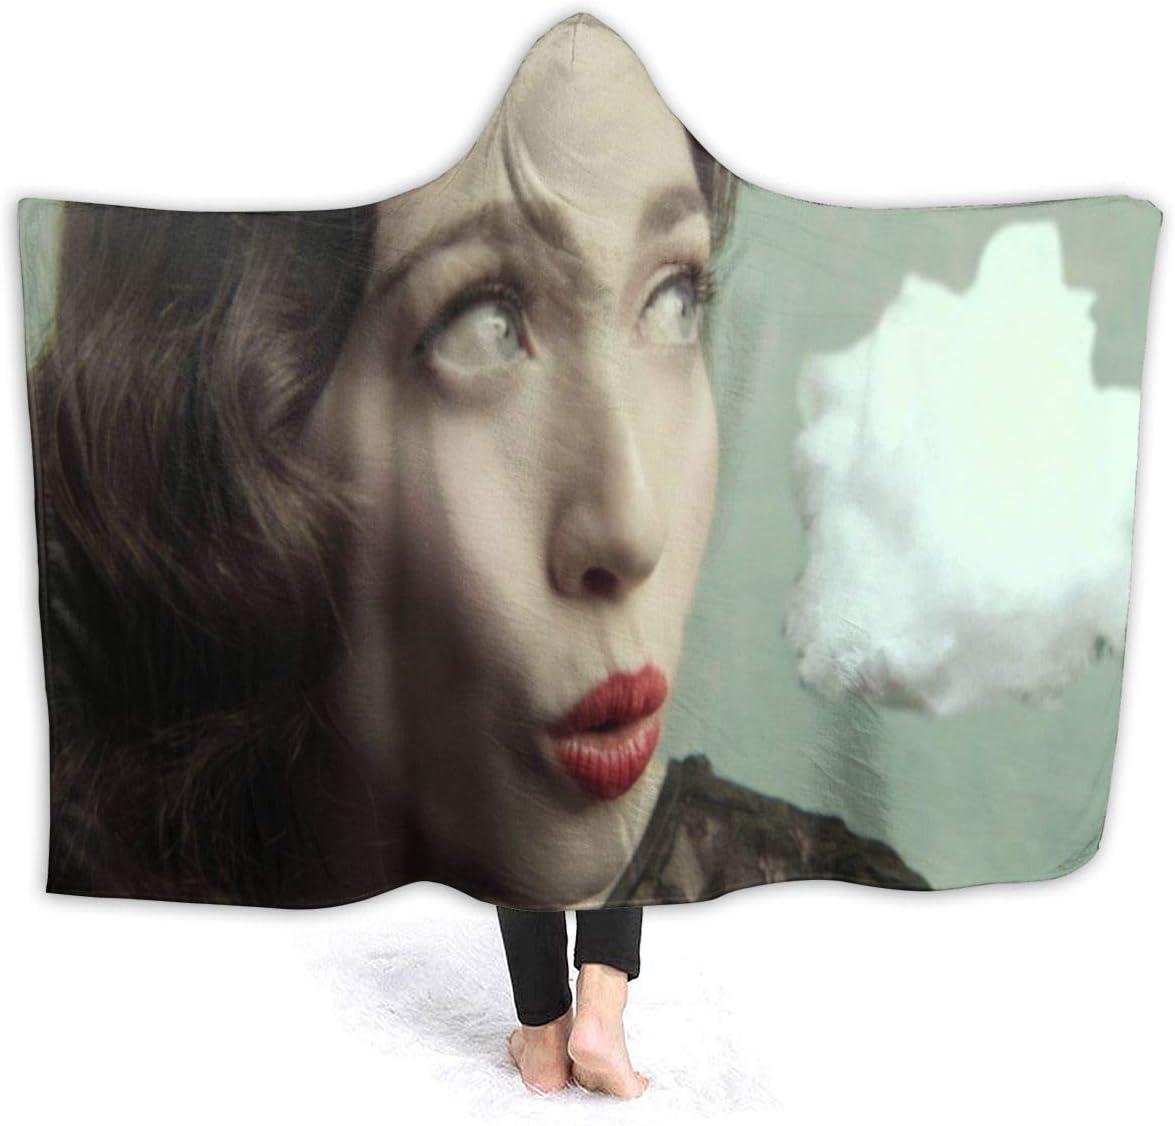 MHOLEBUKL Regina-Spektor Hooded Throw Blanket Cobijas Franela Bedding Manta De Felpa Suave Aire Acondicionado De Oficina Mantas De Sofá Cama para Bolsa De Dormer